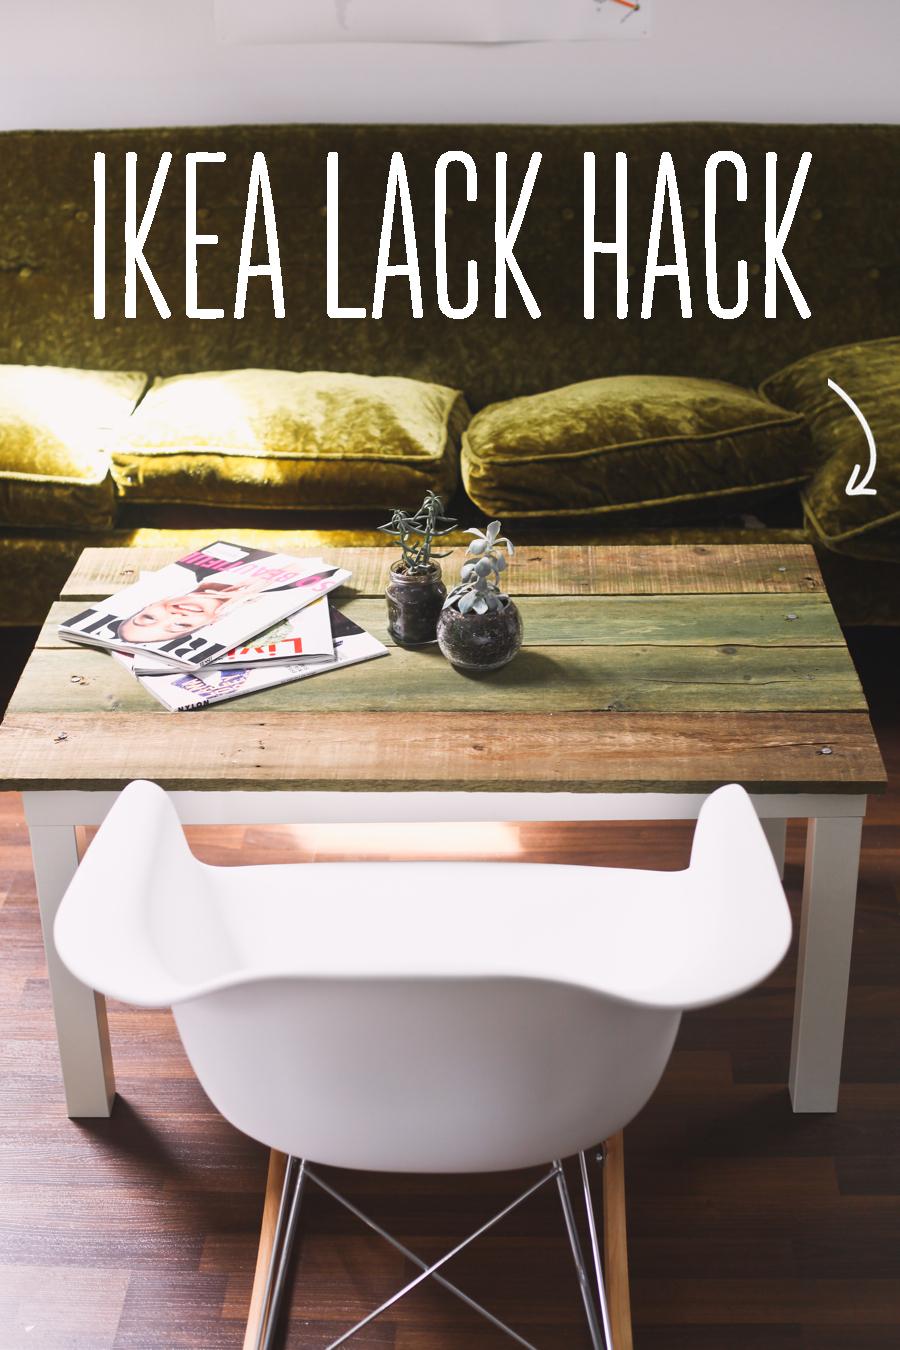 Superb Ikea Hacks: 3 Easy Steps To Create Your Own Ikea Coffee Table